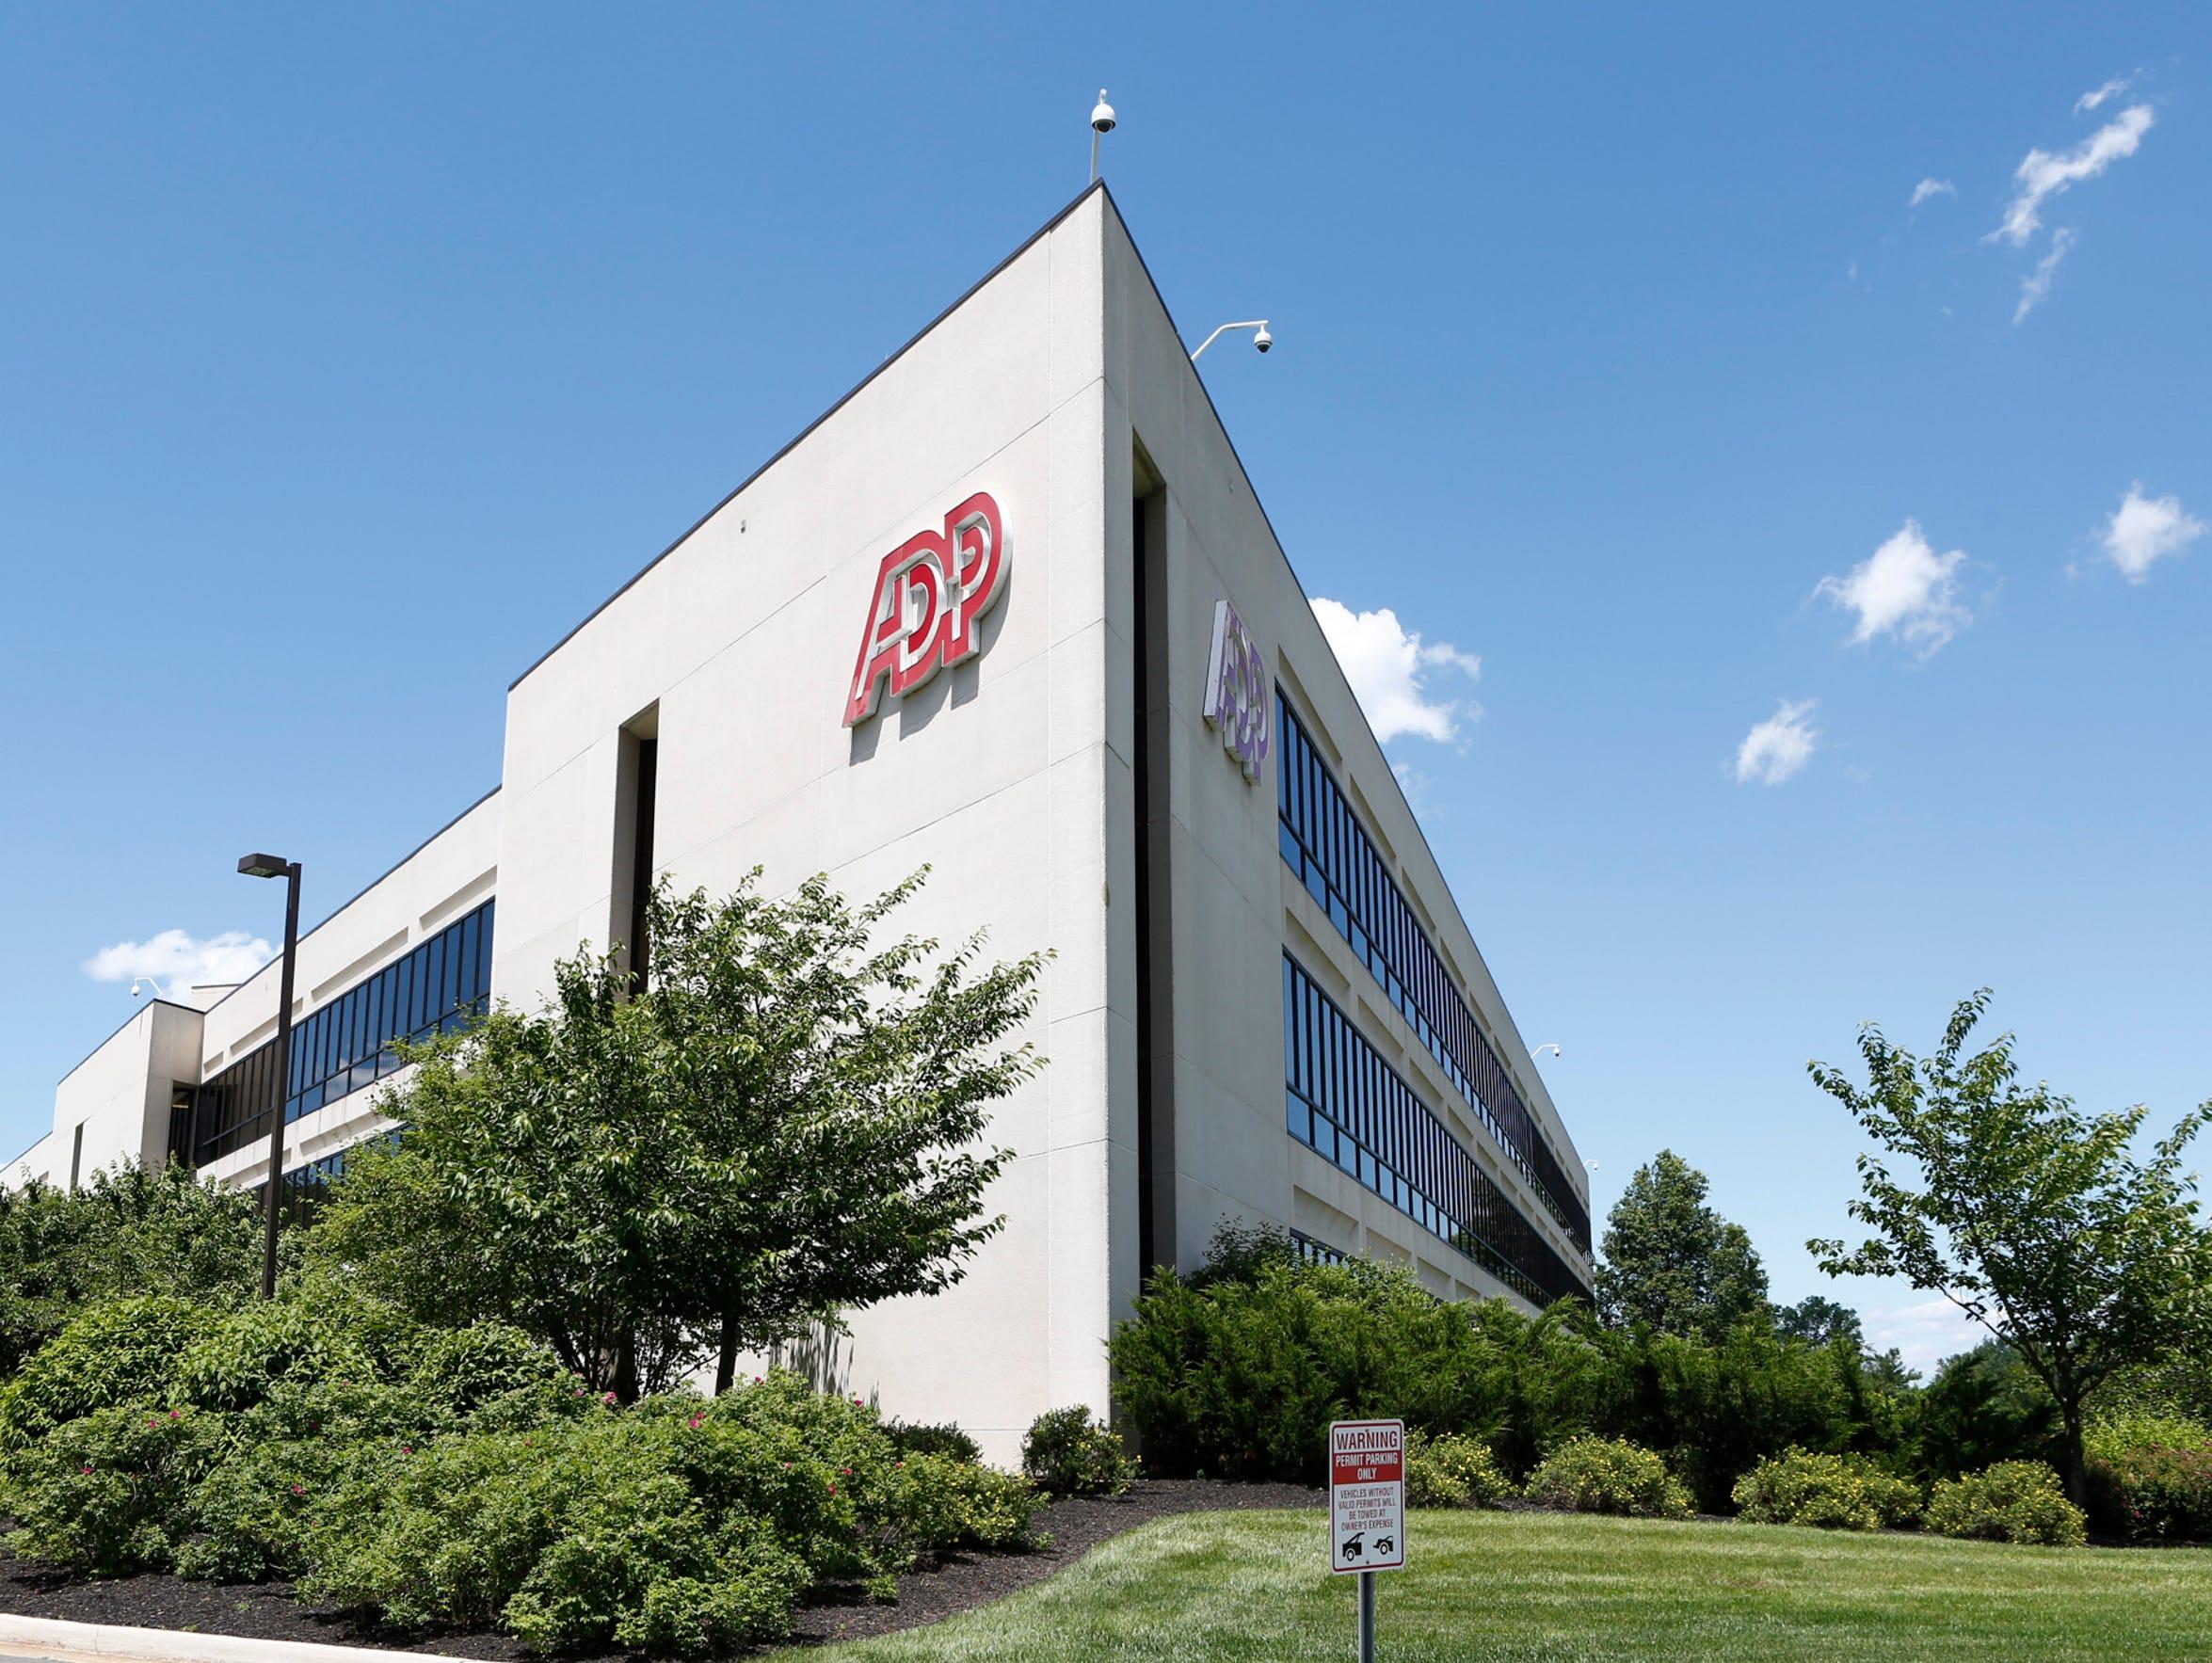 The ADP headquarters in Roseland, N. J. Tuesday, June